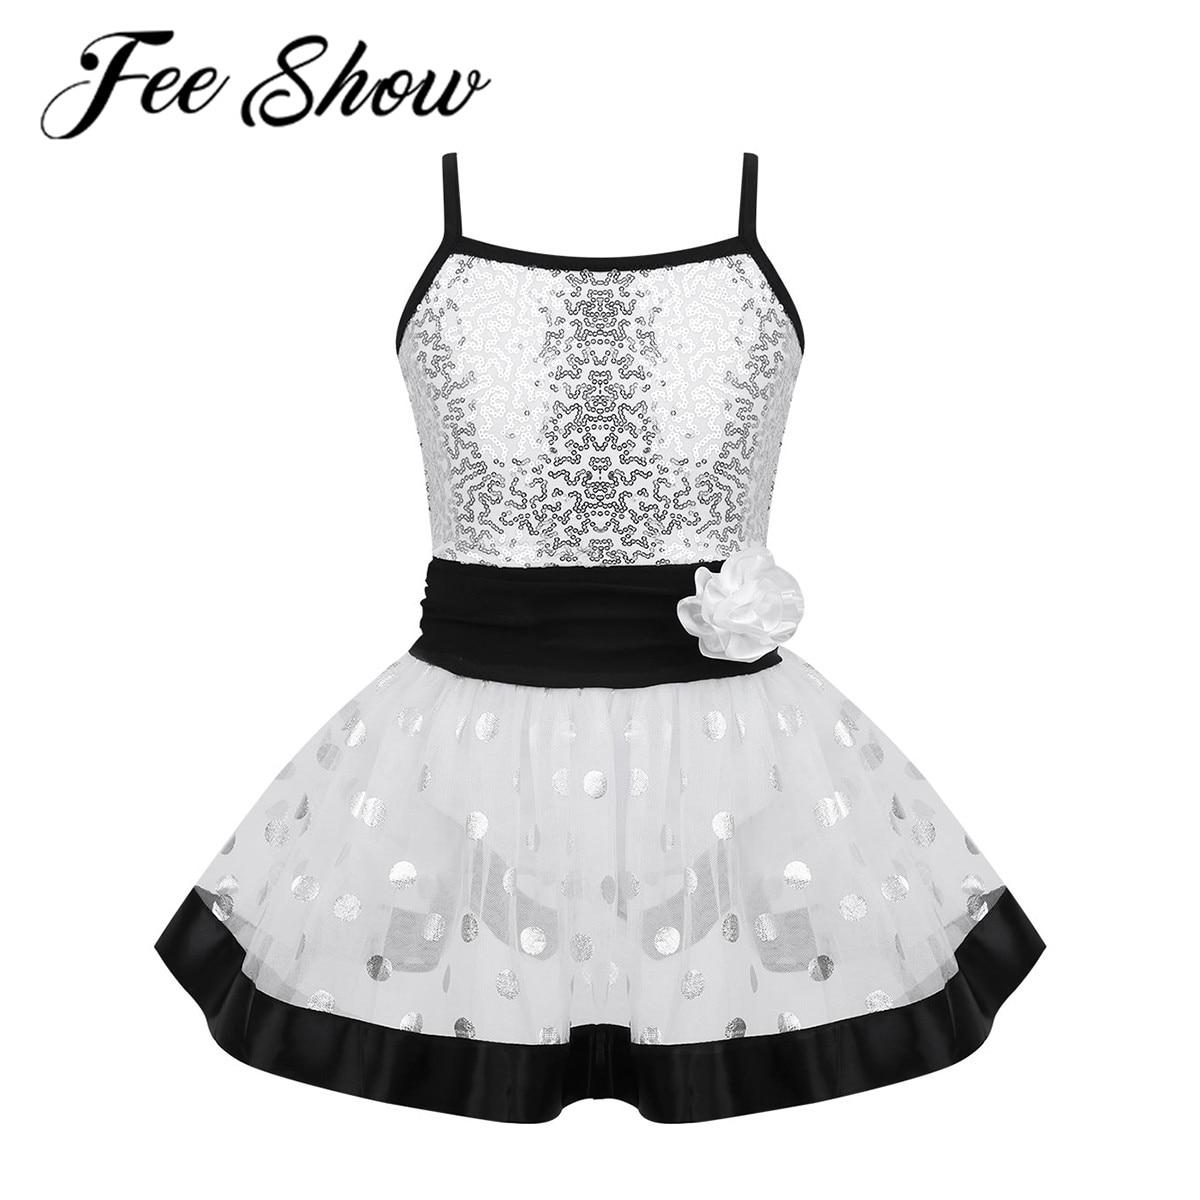 Kids Girls Glitter Shiny White Black Skirt Child Ballet Dance Gymnastics Leotard Tutu Skirts Ballerina Costume Dress For Dancing